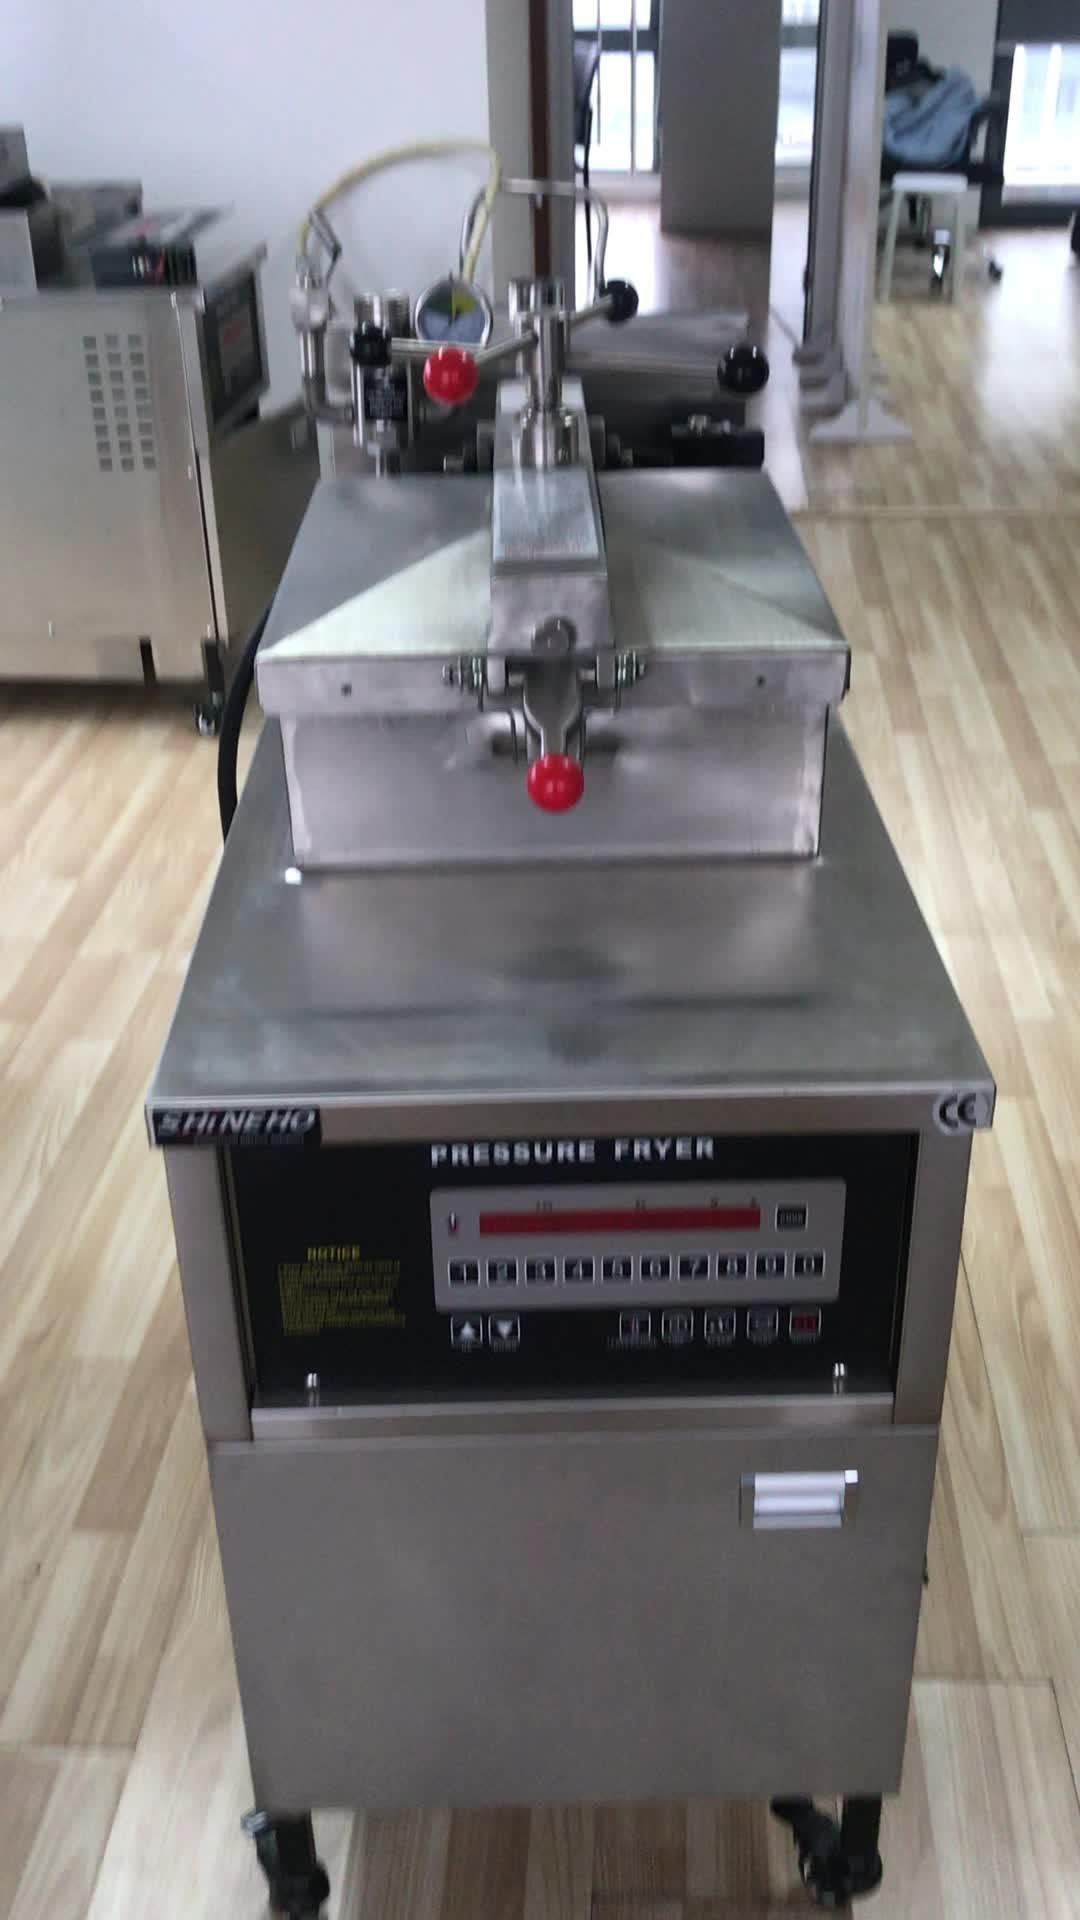 P007 briet Hühnermaschine / Penny-Fritteuse / KFC-Hühnchen-Bratmaschine